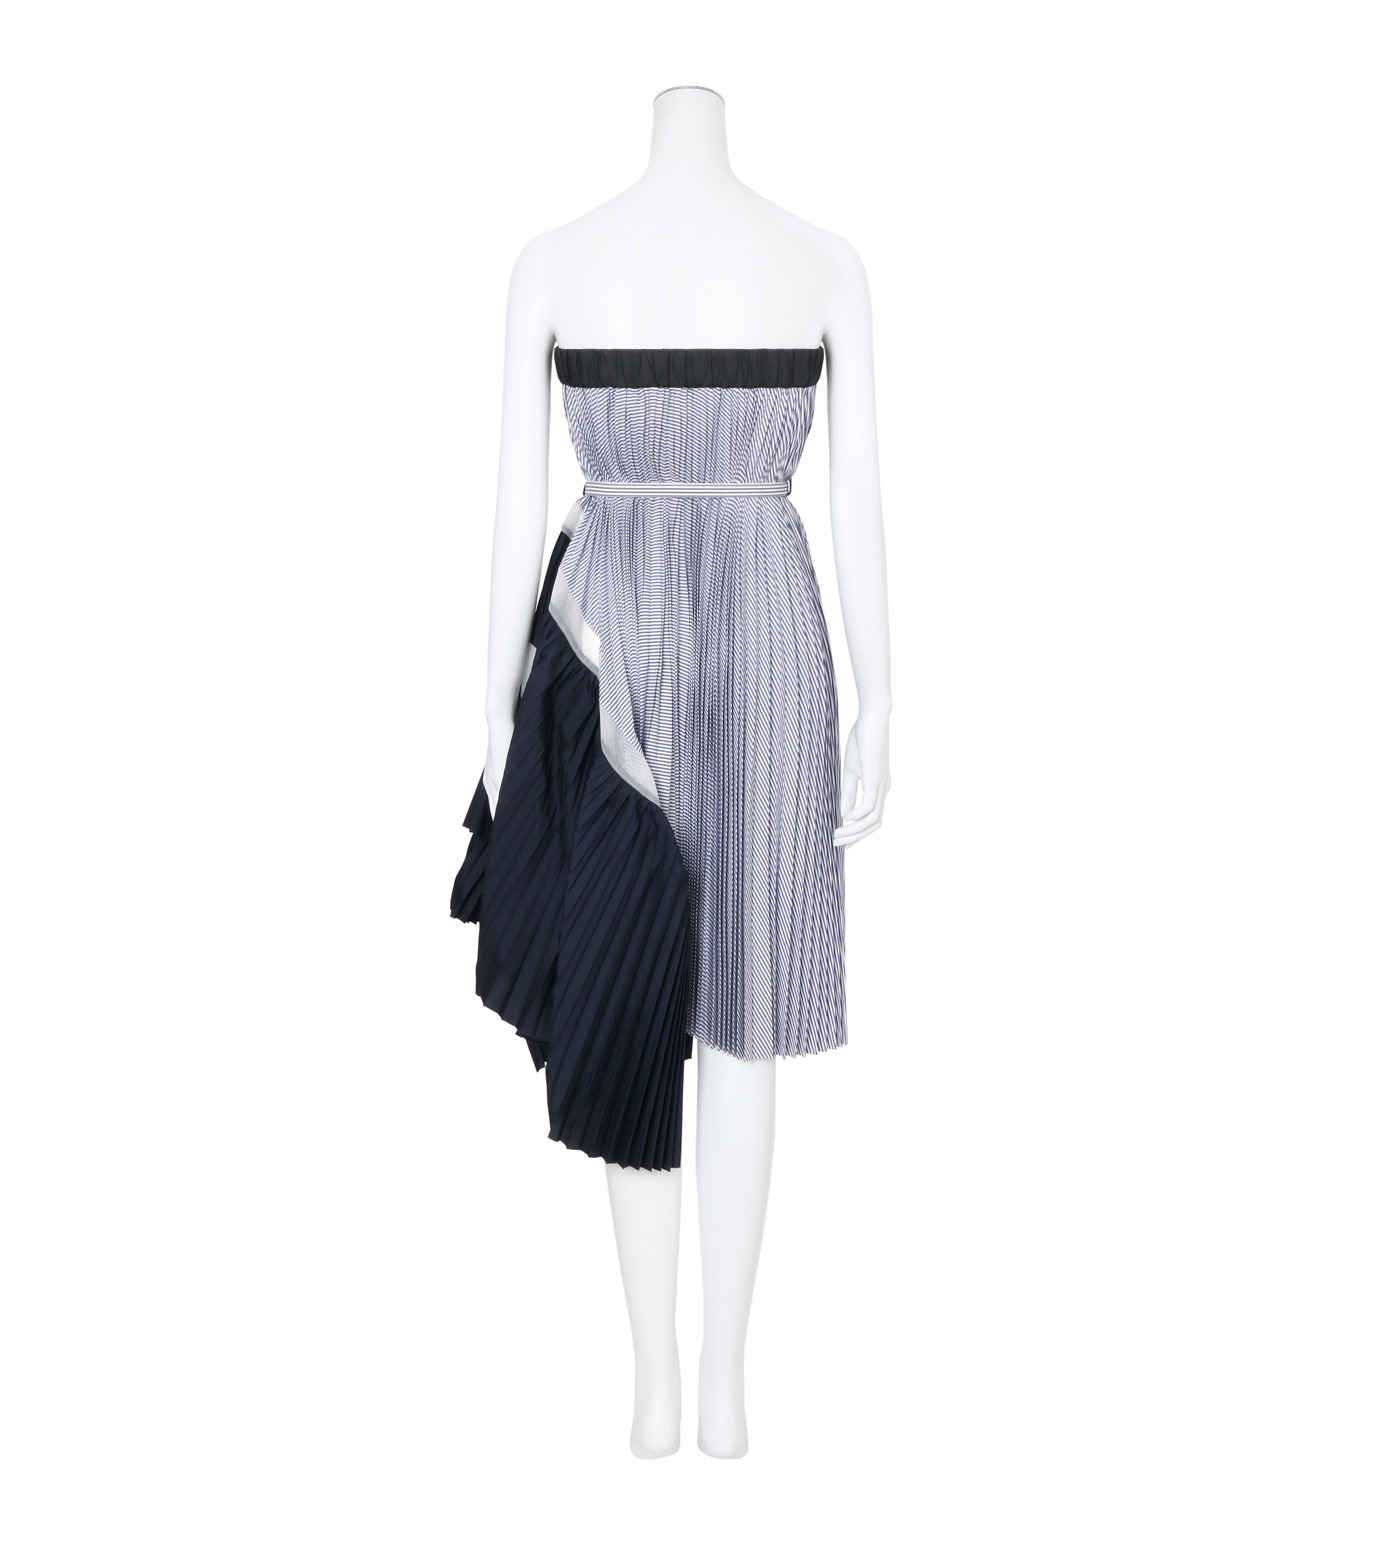 Sacai(サカイ)のClassic Shirting Tube Dress-LIGHT BLUE(ワンピース/one piece)-17-02967-91 拡大詳細画像2